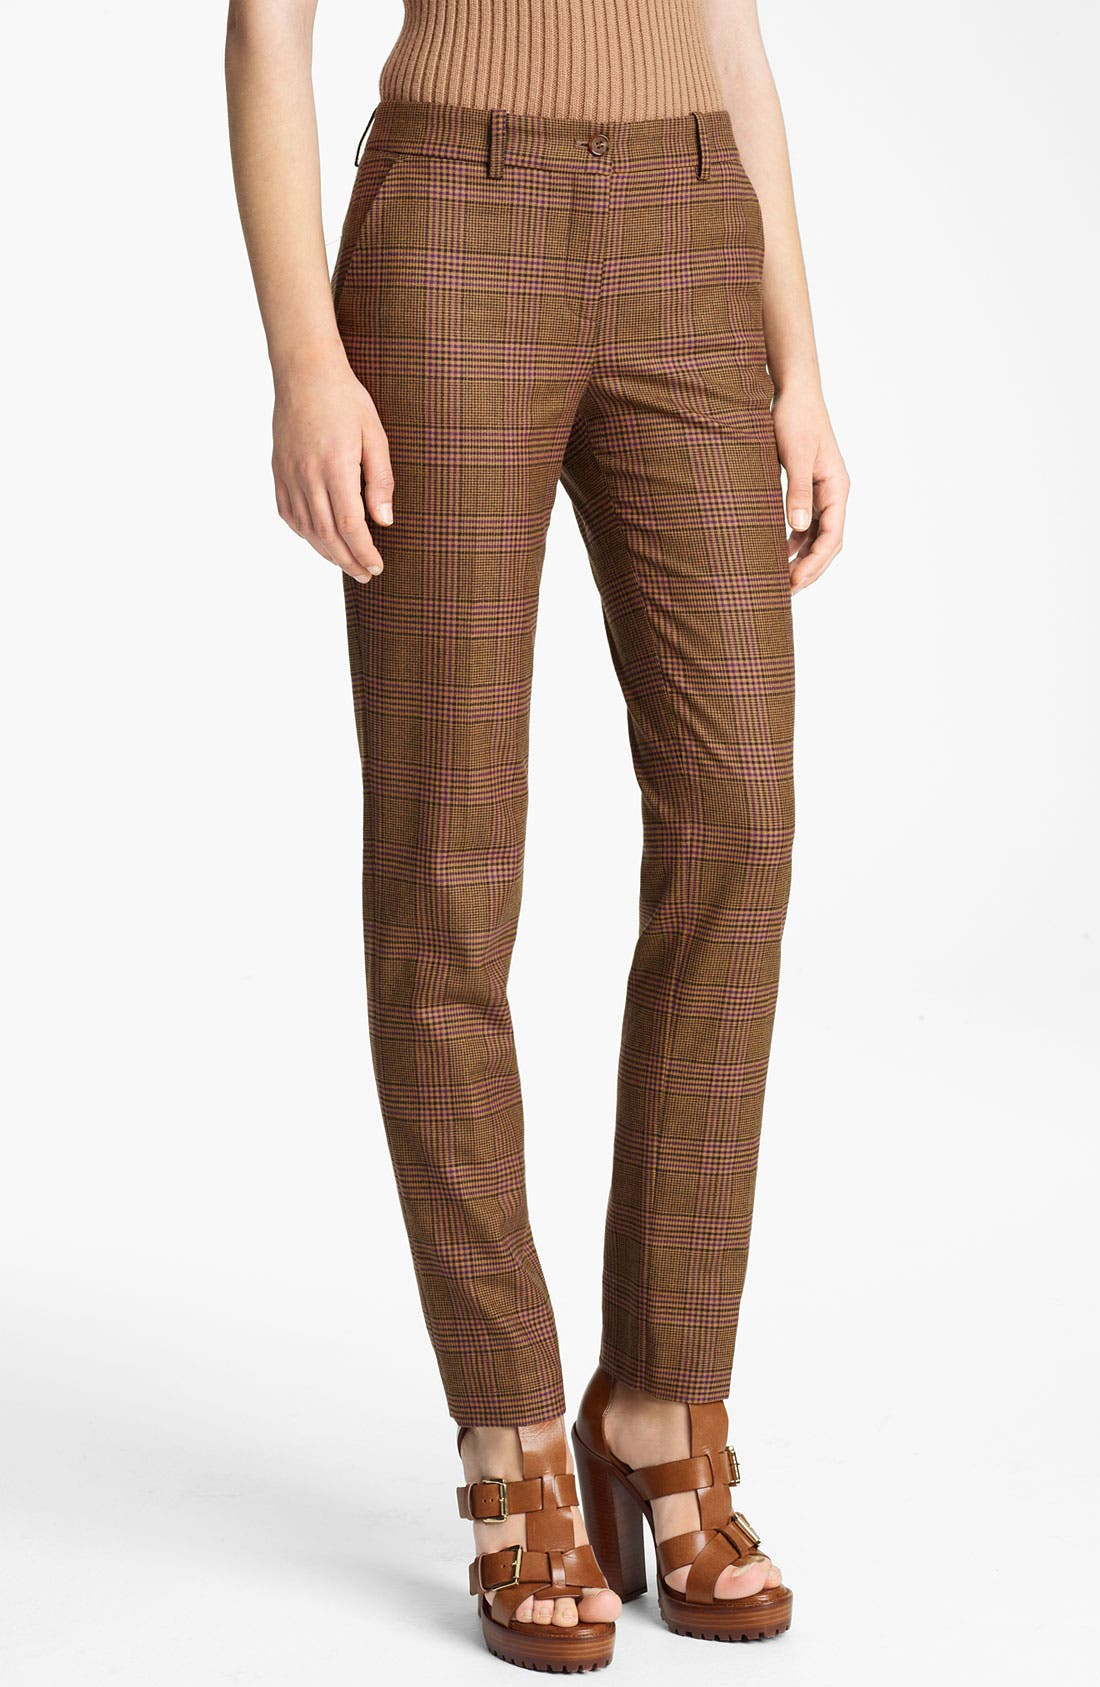 Alternate Image 1 Selected - Michael Kors 'Samantha' Skinny Plaid Wool Pants